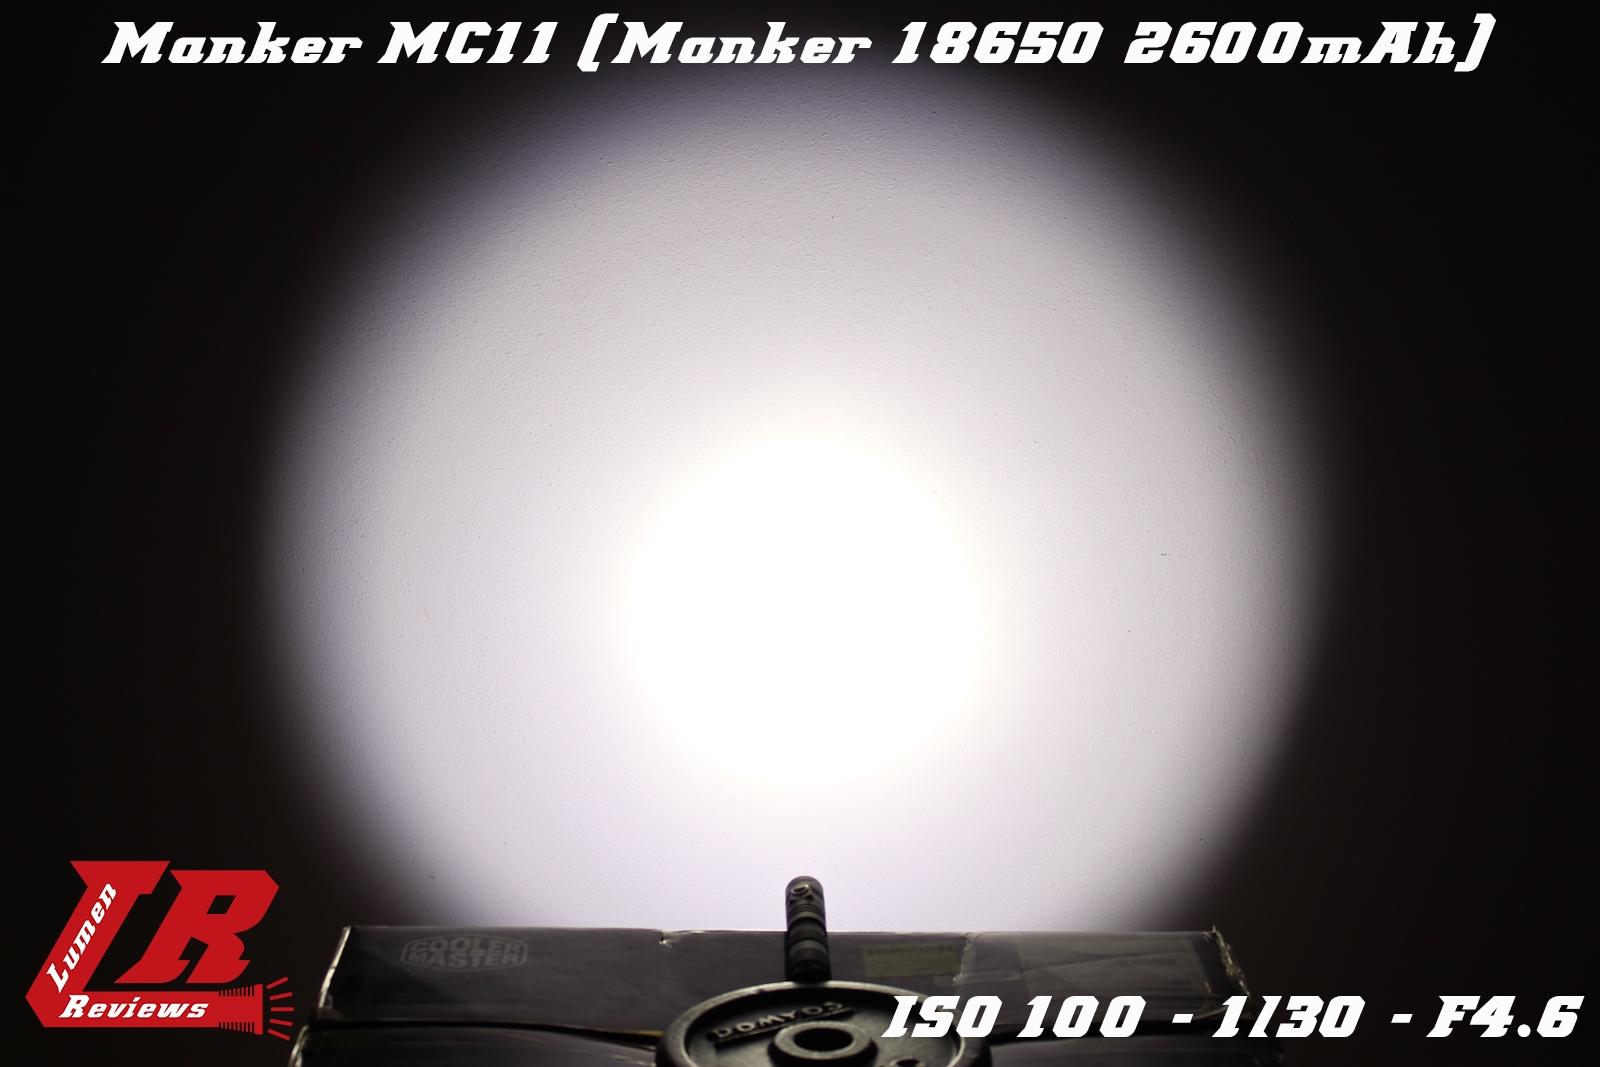 Manker MC11 BS 1